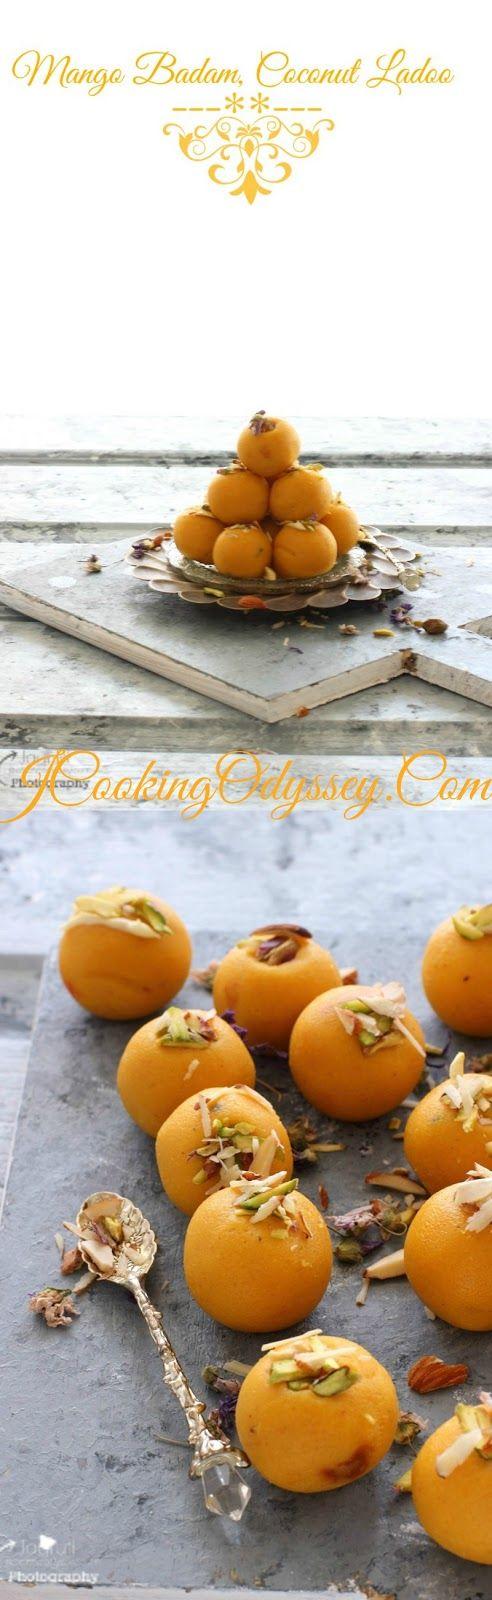 Jagruti's Cooking Odyssey: Mango, Badam, Coconut Ladoo - The season of fast and feast is here !